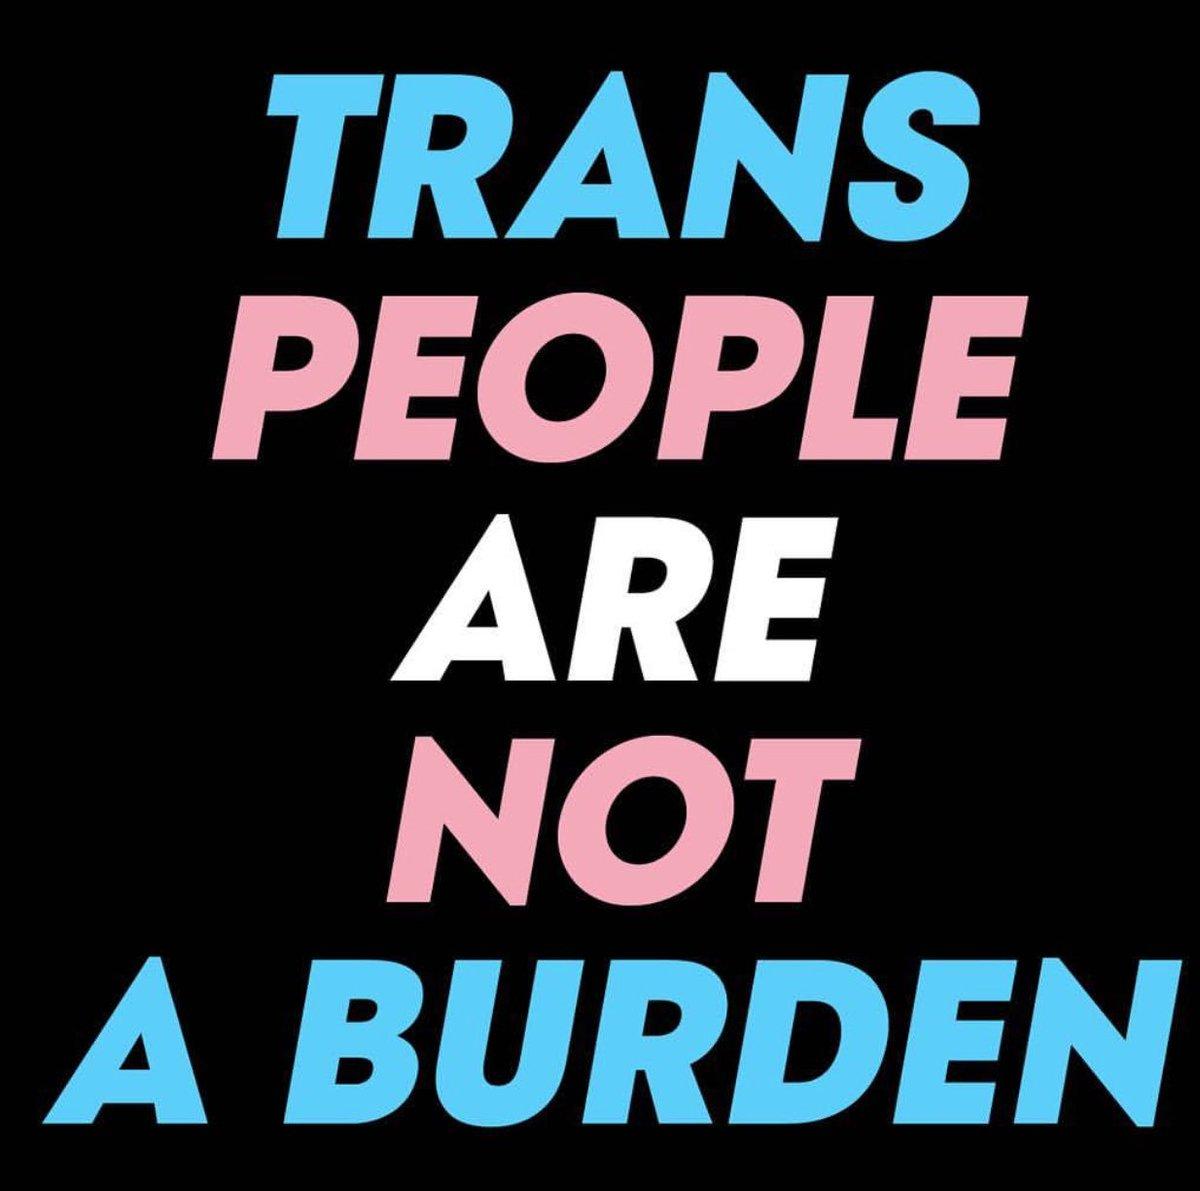 Repost repost REPOST!! #TransRightsAreHumanRights